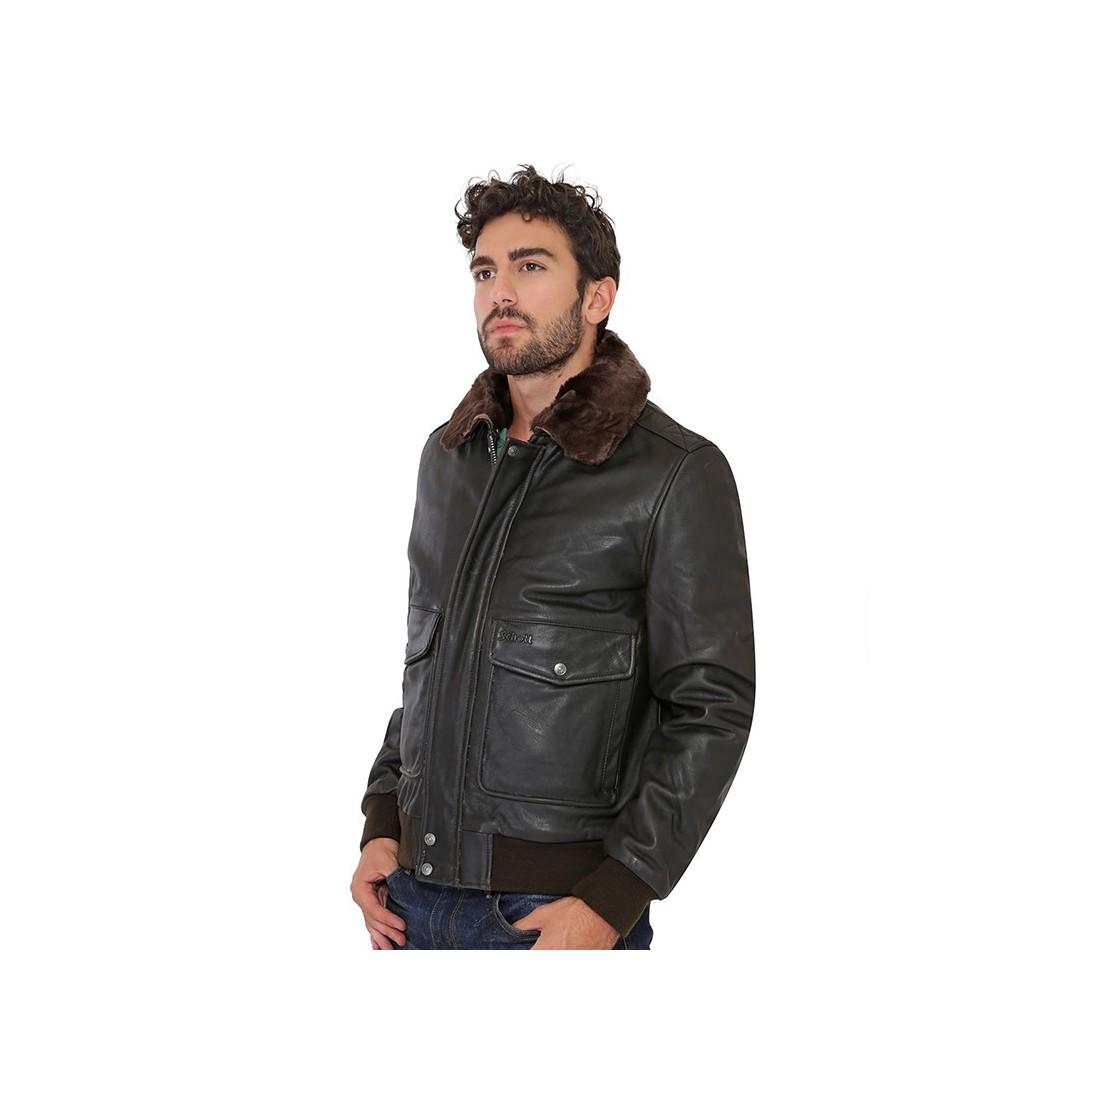 blouson lc5331x de schott en cuir homme marron. Black Bedroom Furniture Sets. Home Design Ideas